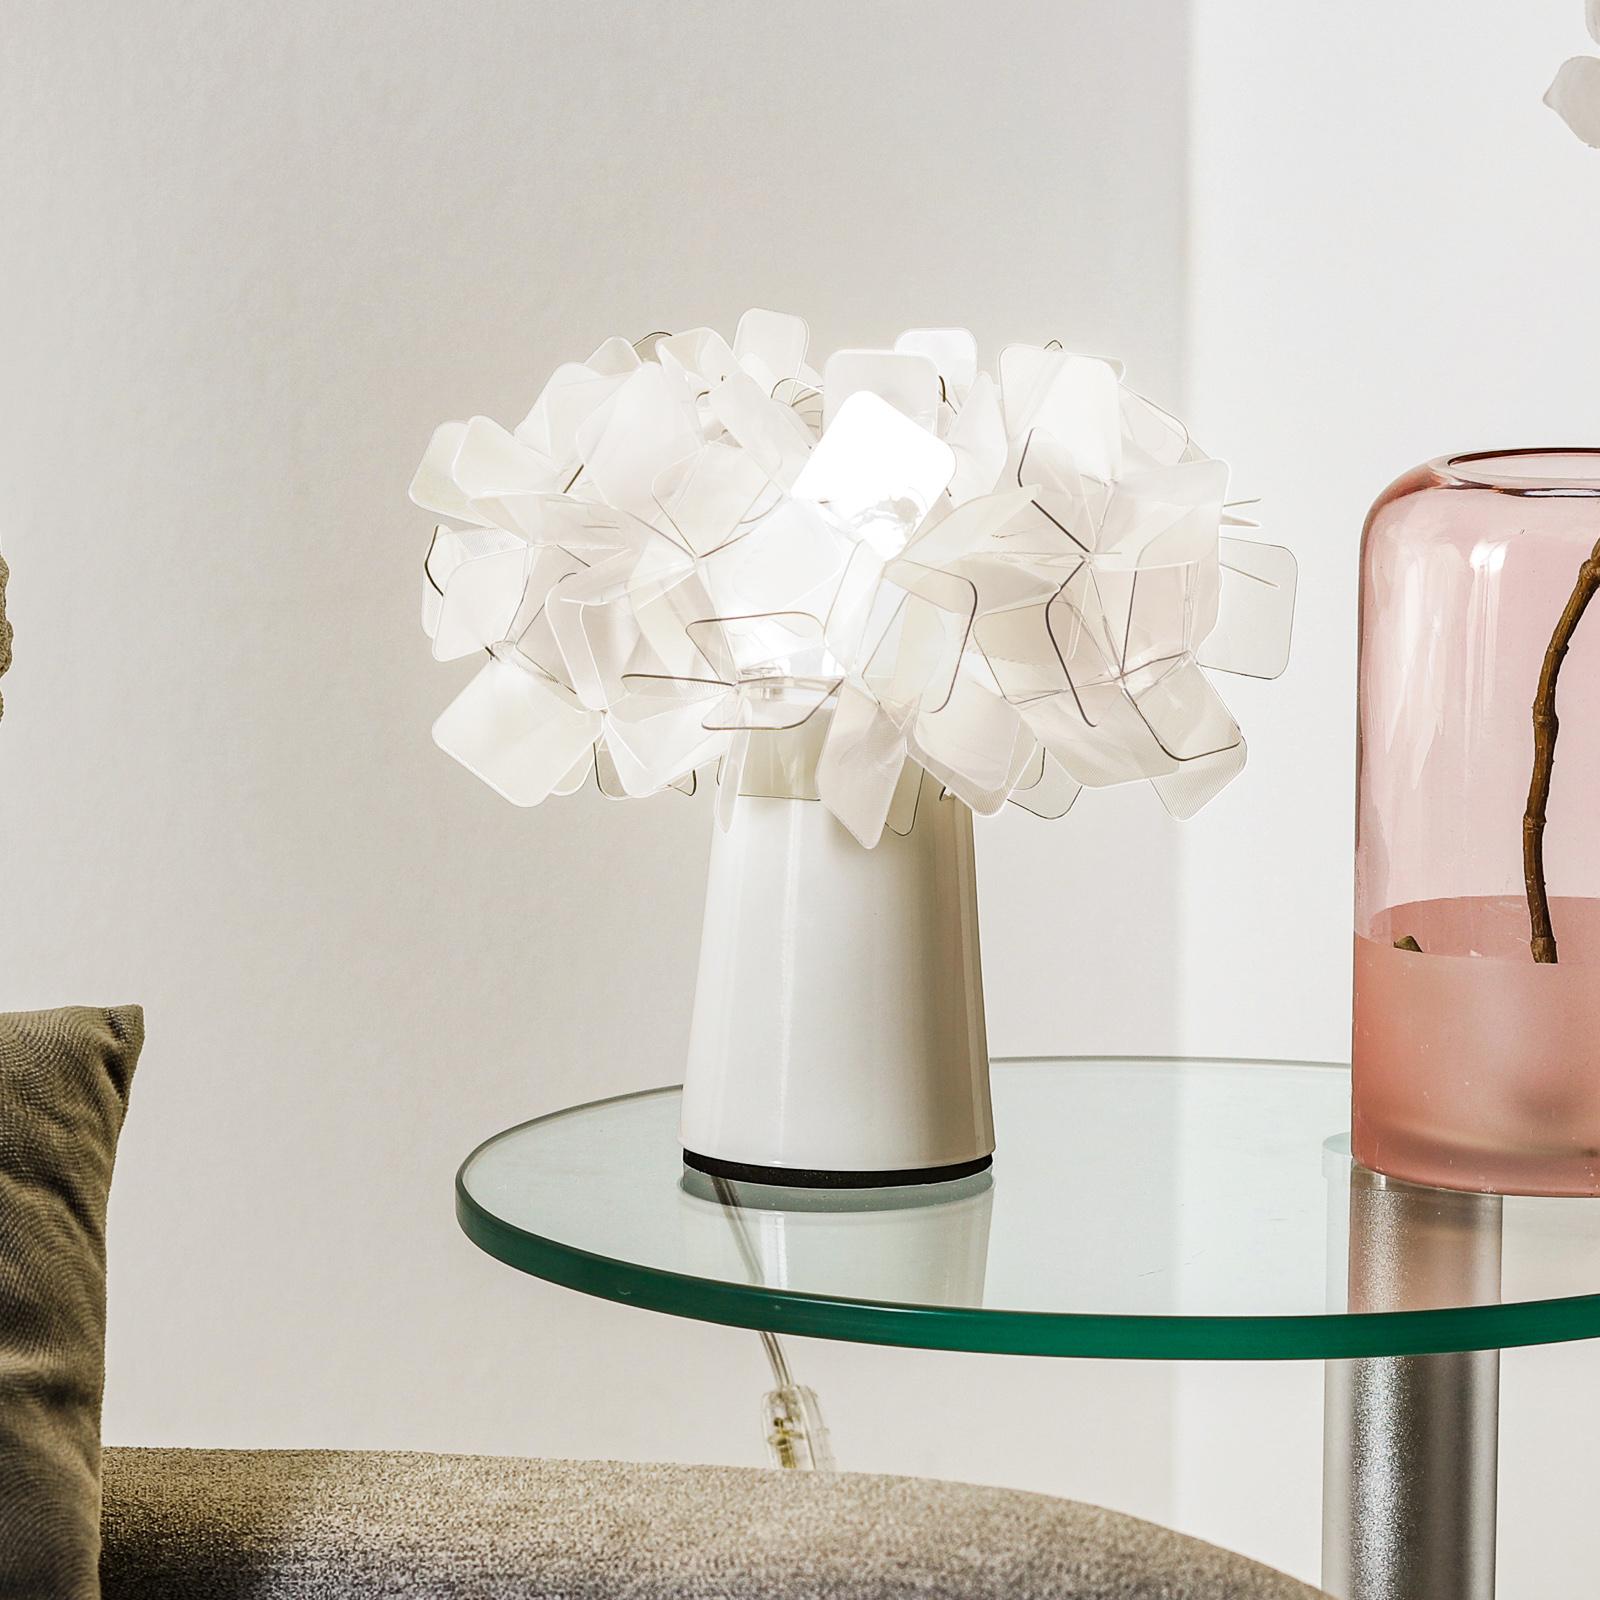 Slamp Clizia - Design-Tischleuchte, rauchgrau